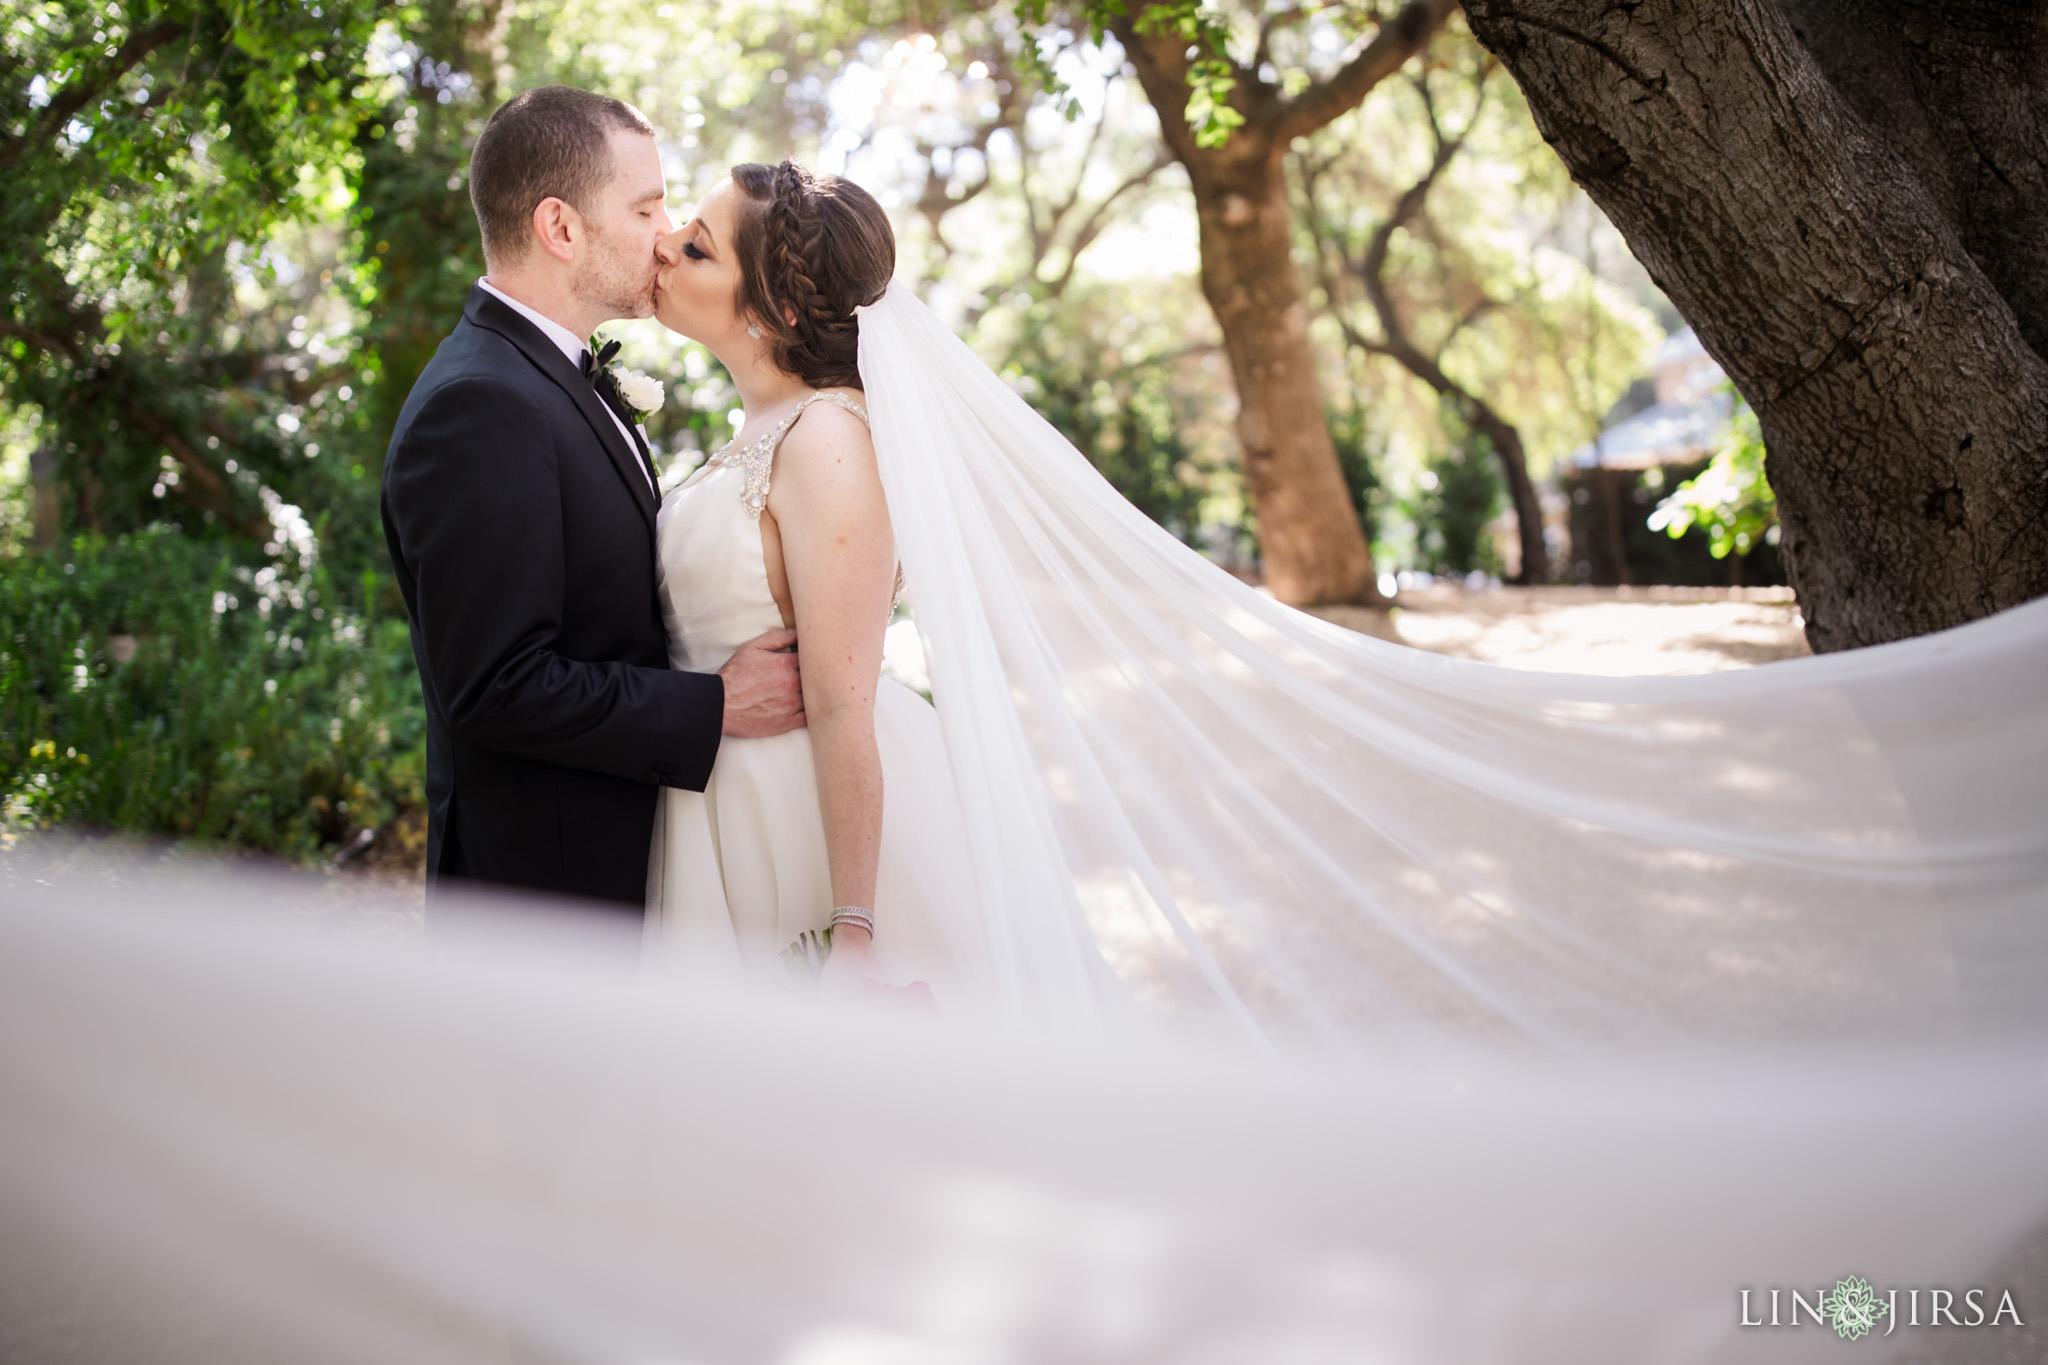 Calamigos Ranch Malibu Wedding Photography